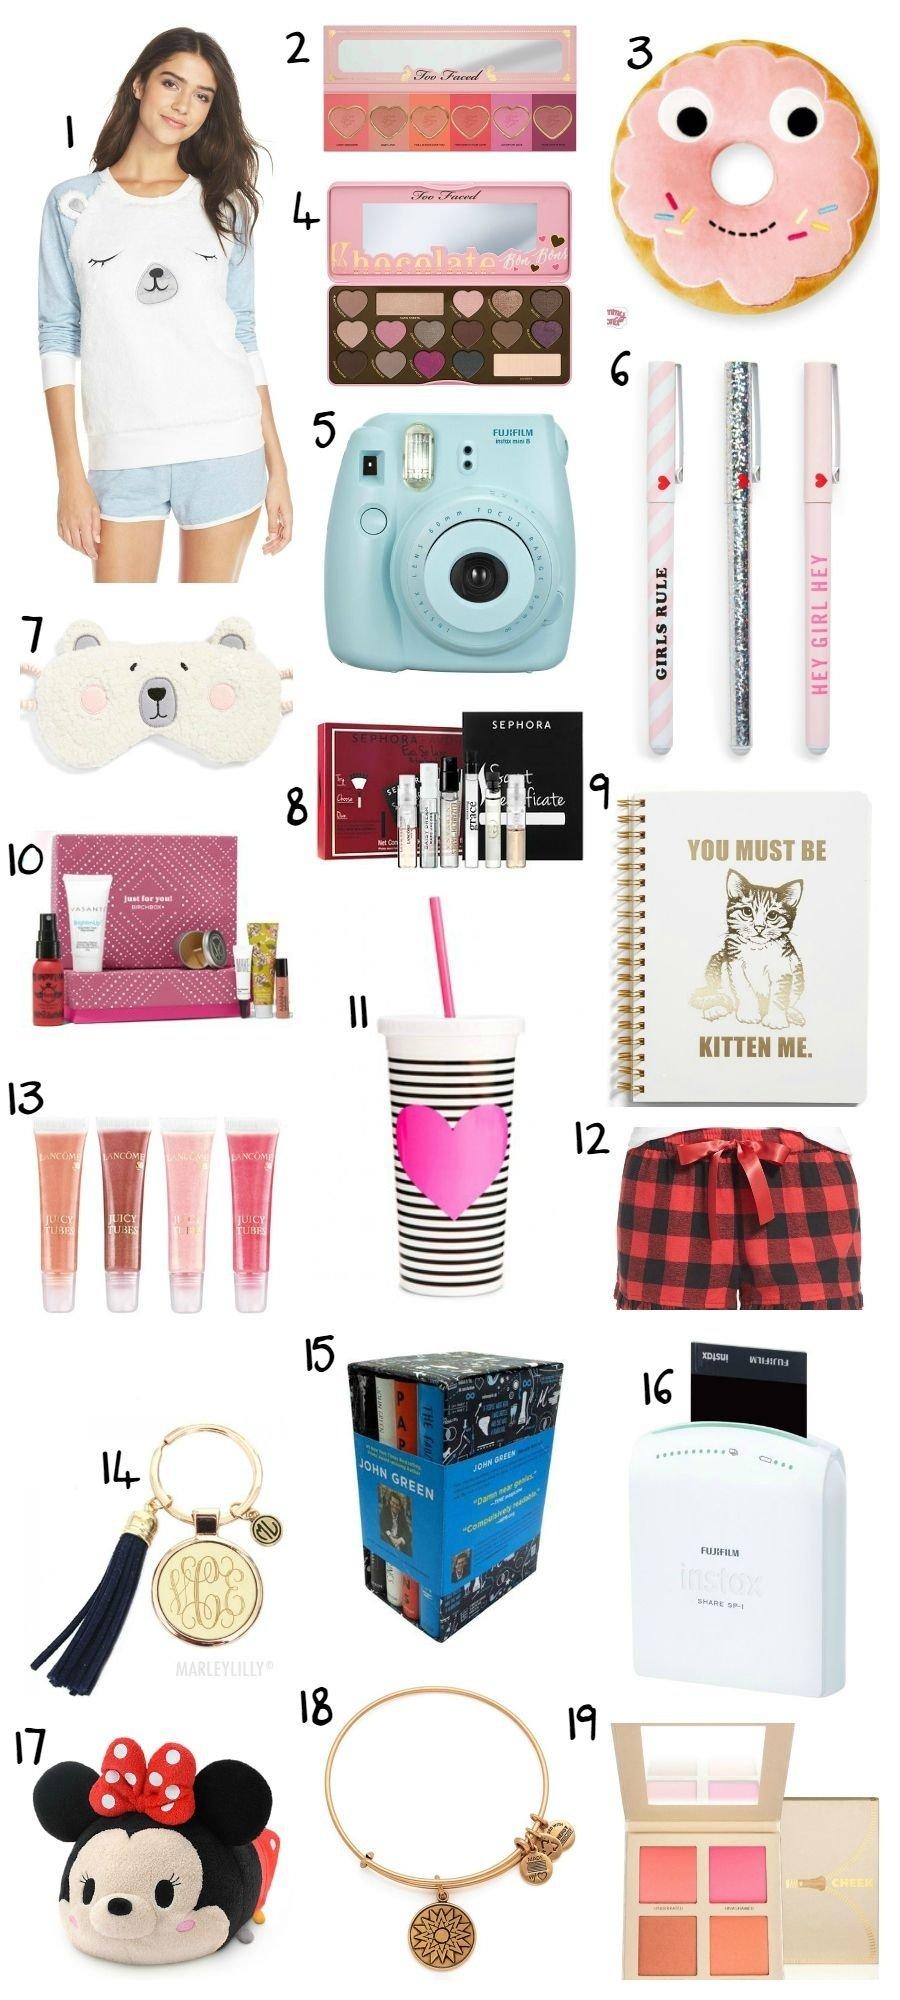 10 Best Good Christmas Gift Ideas For Teenage Girls best christmas gift ideas for teens ashley brooke christmas gift 25 2020